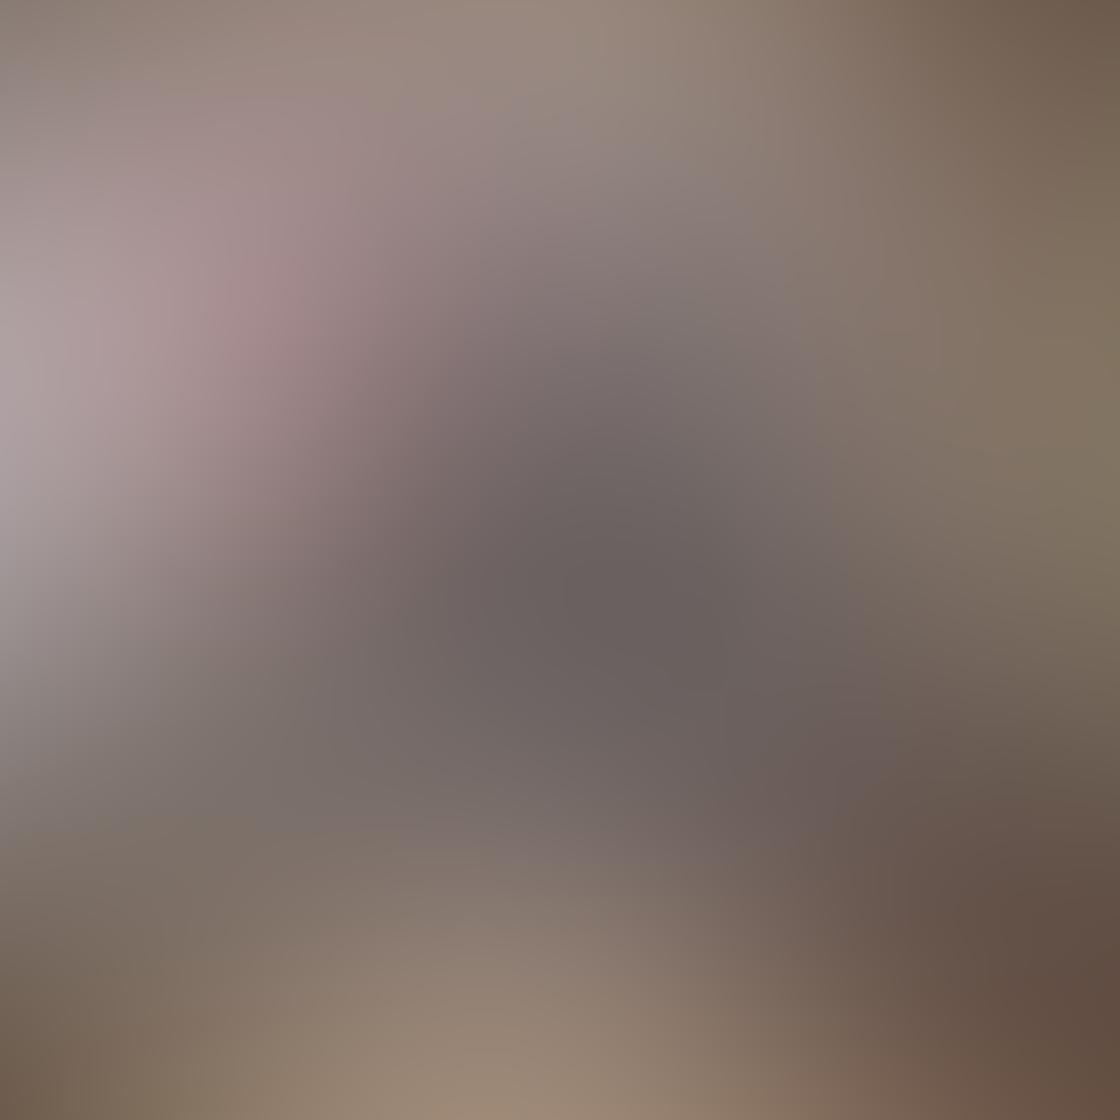 iPhone Photos Editing Styles 3